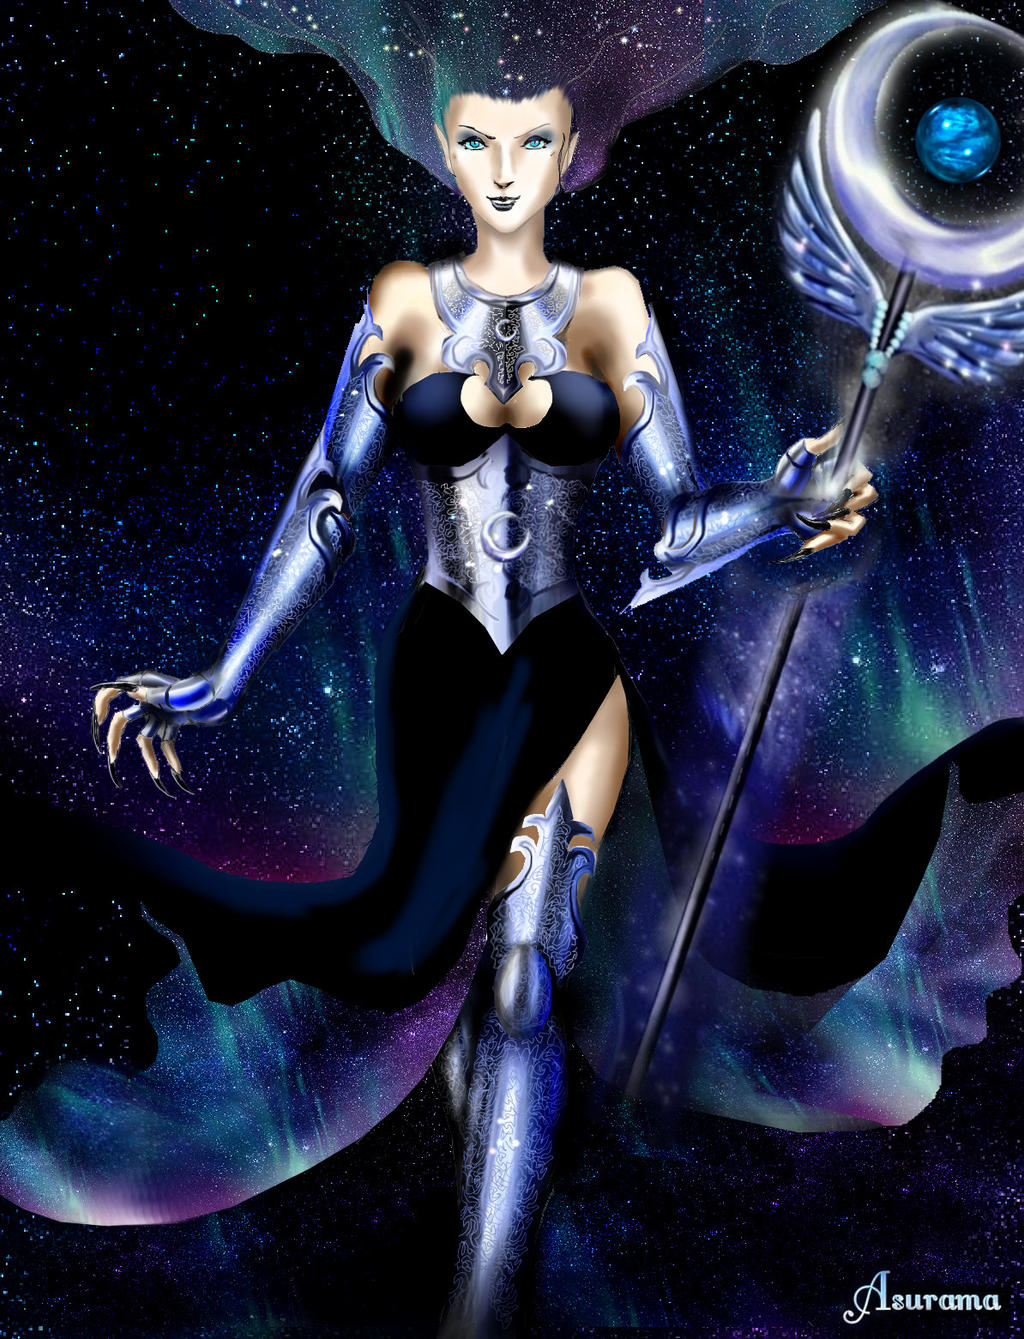 Dancer Princess Luna by Stardust00 on DeviantArt